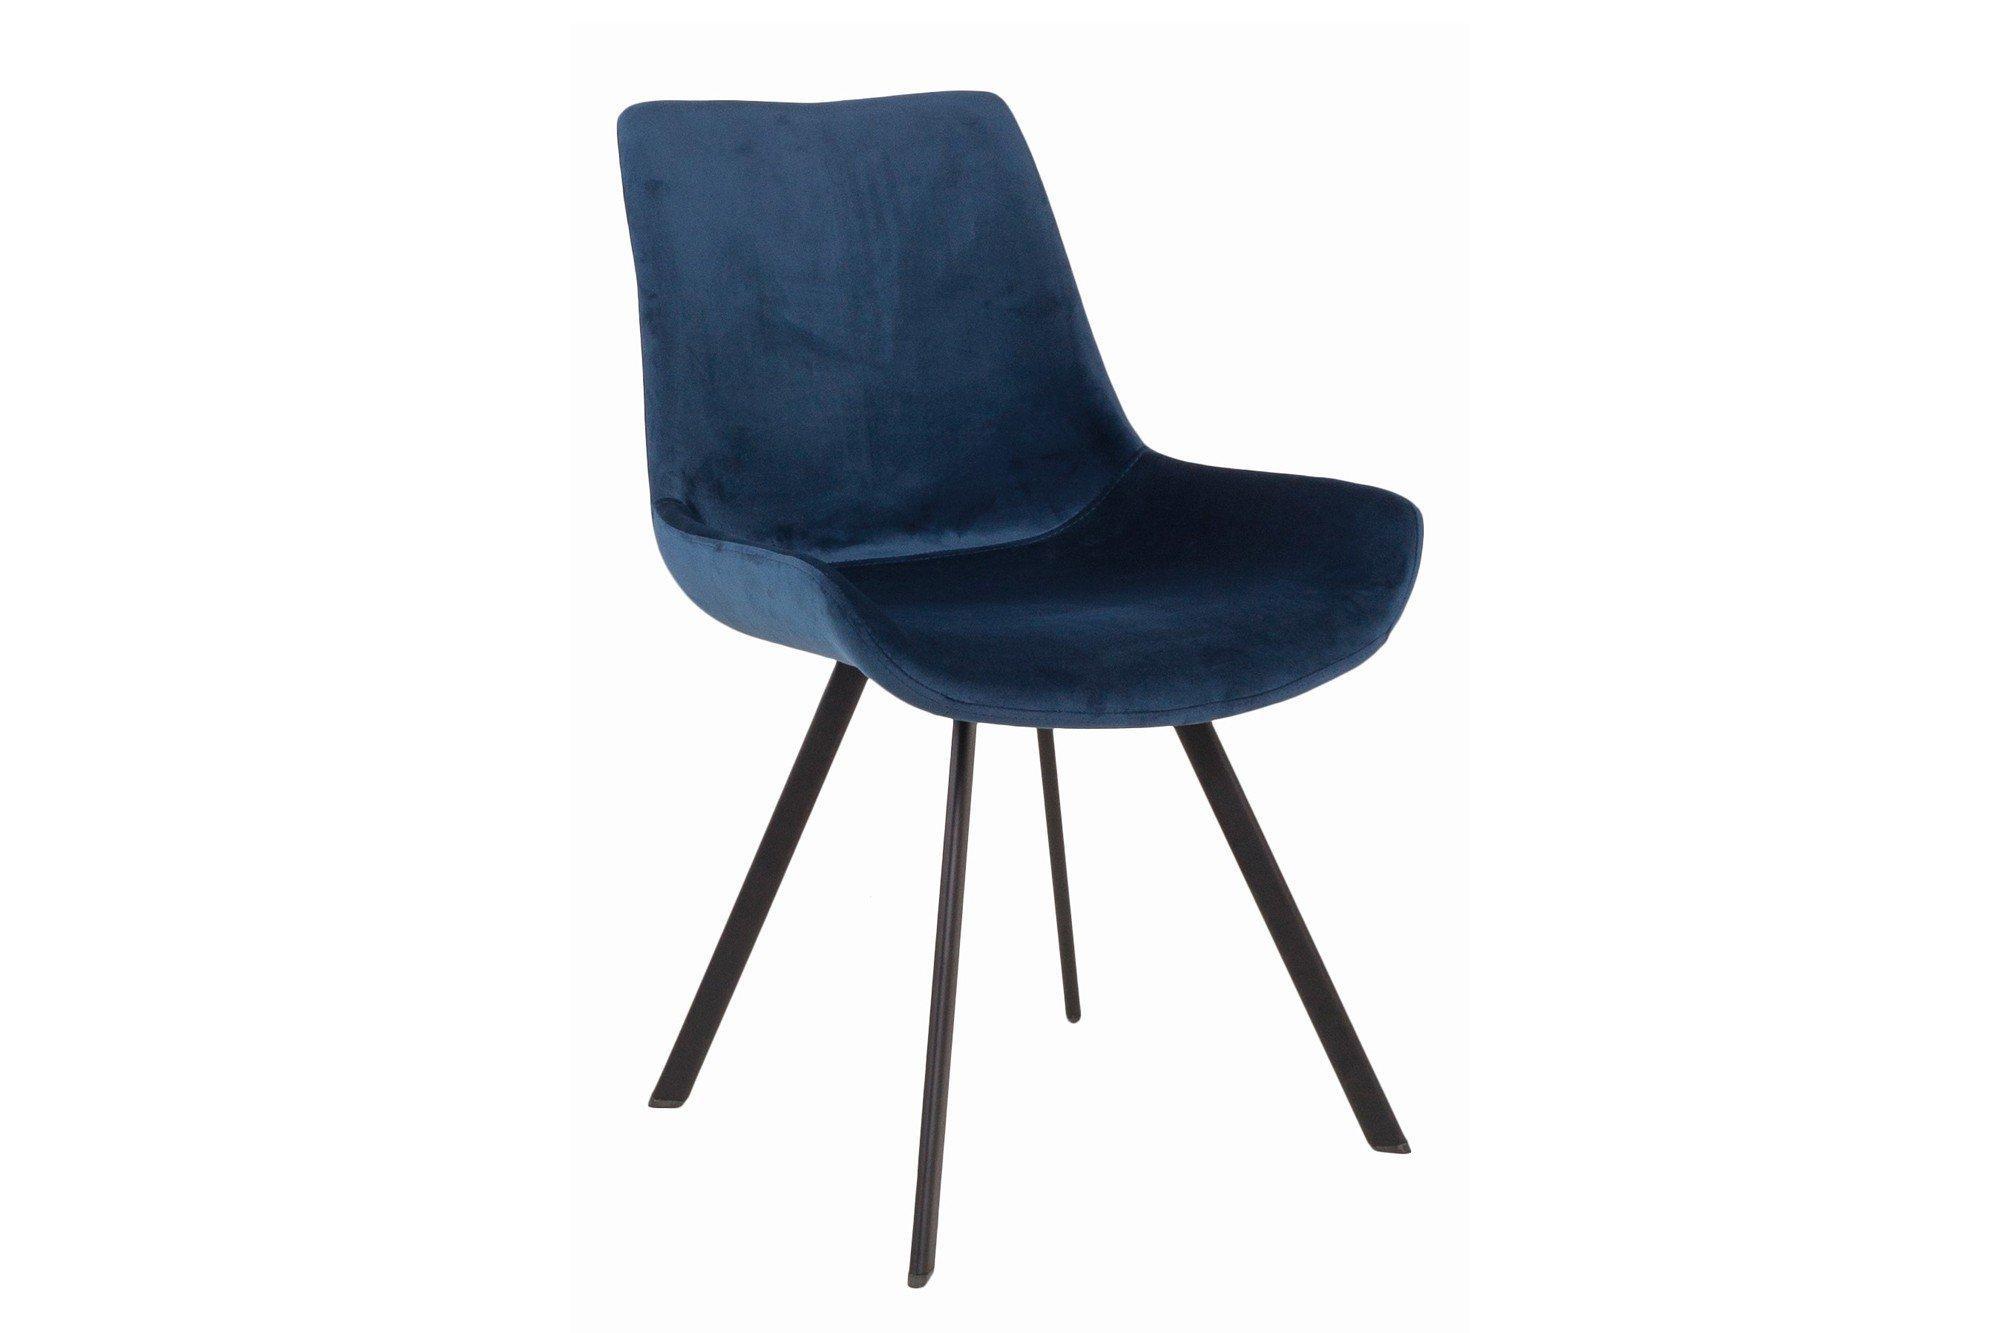 Blaue Samt Stühle